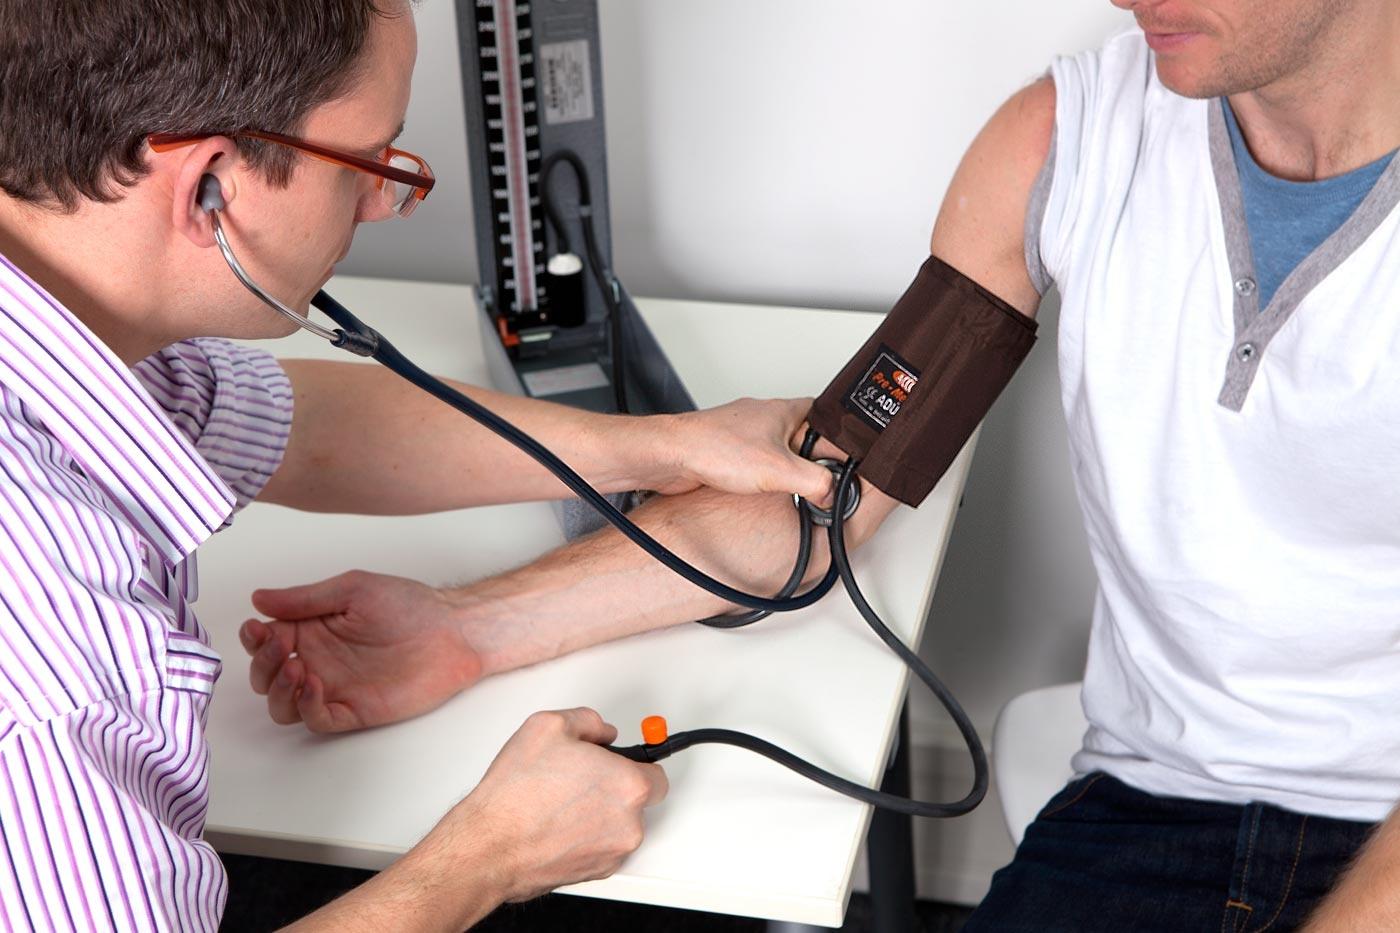 Record the true blood pressure